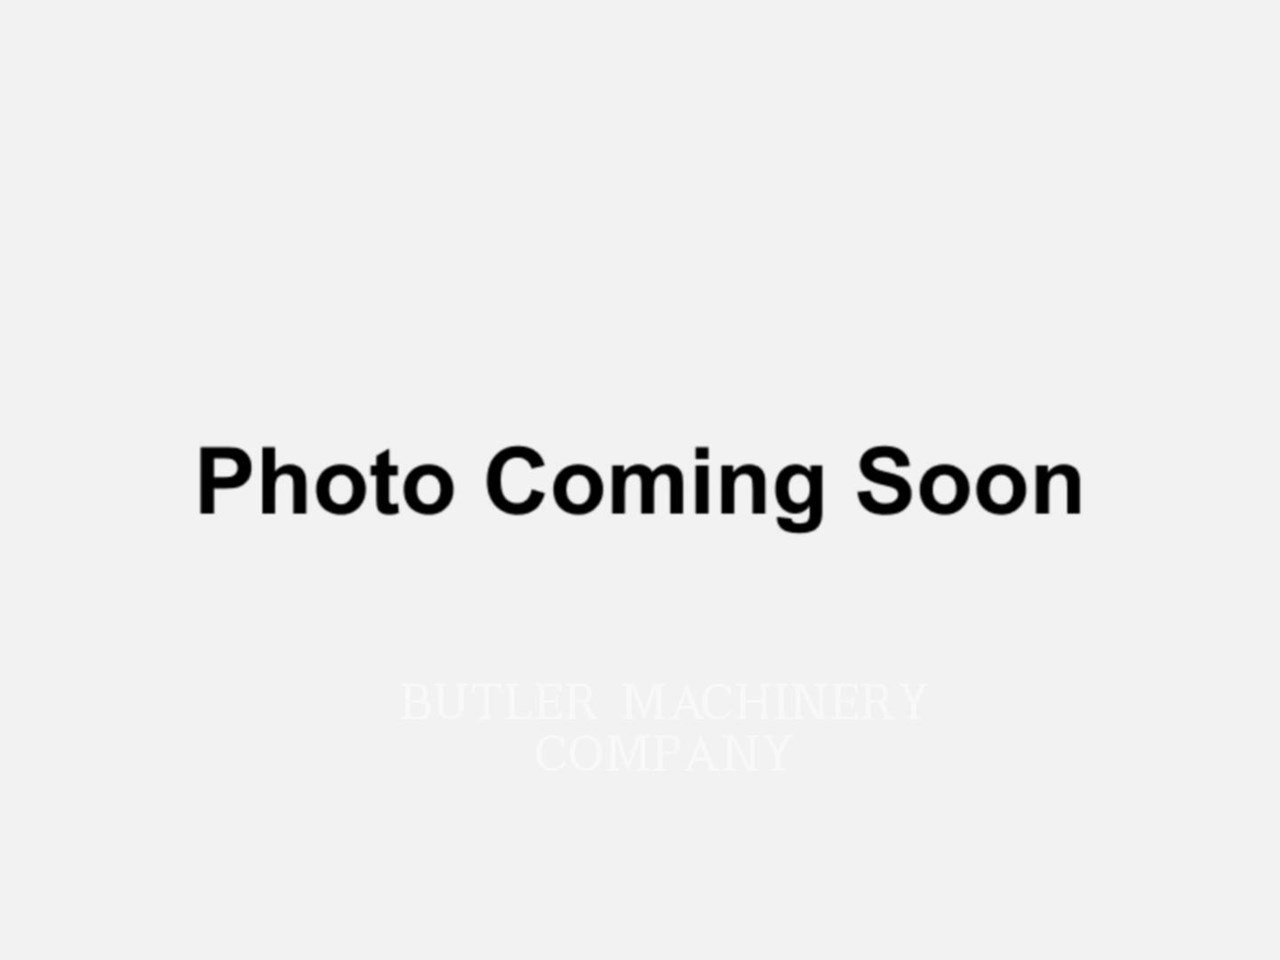 2019 Caterpillar 966 M Image 8